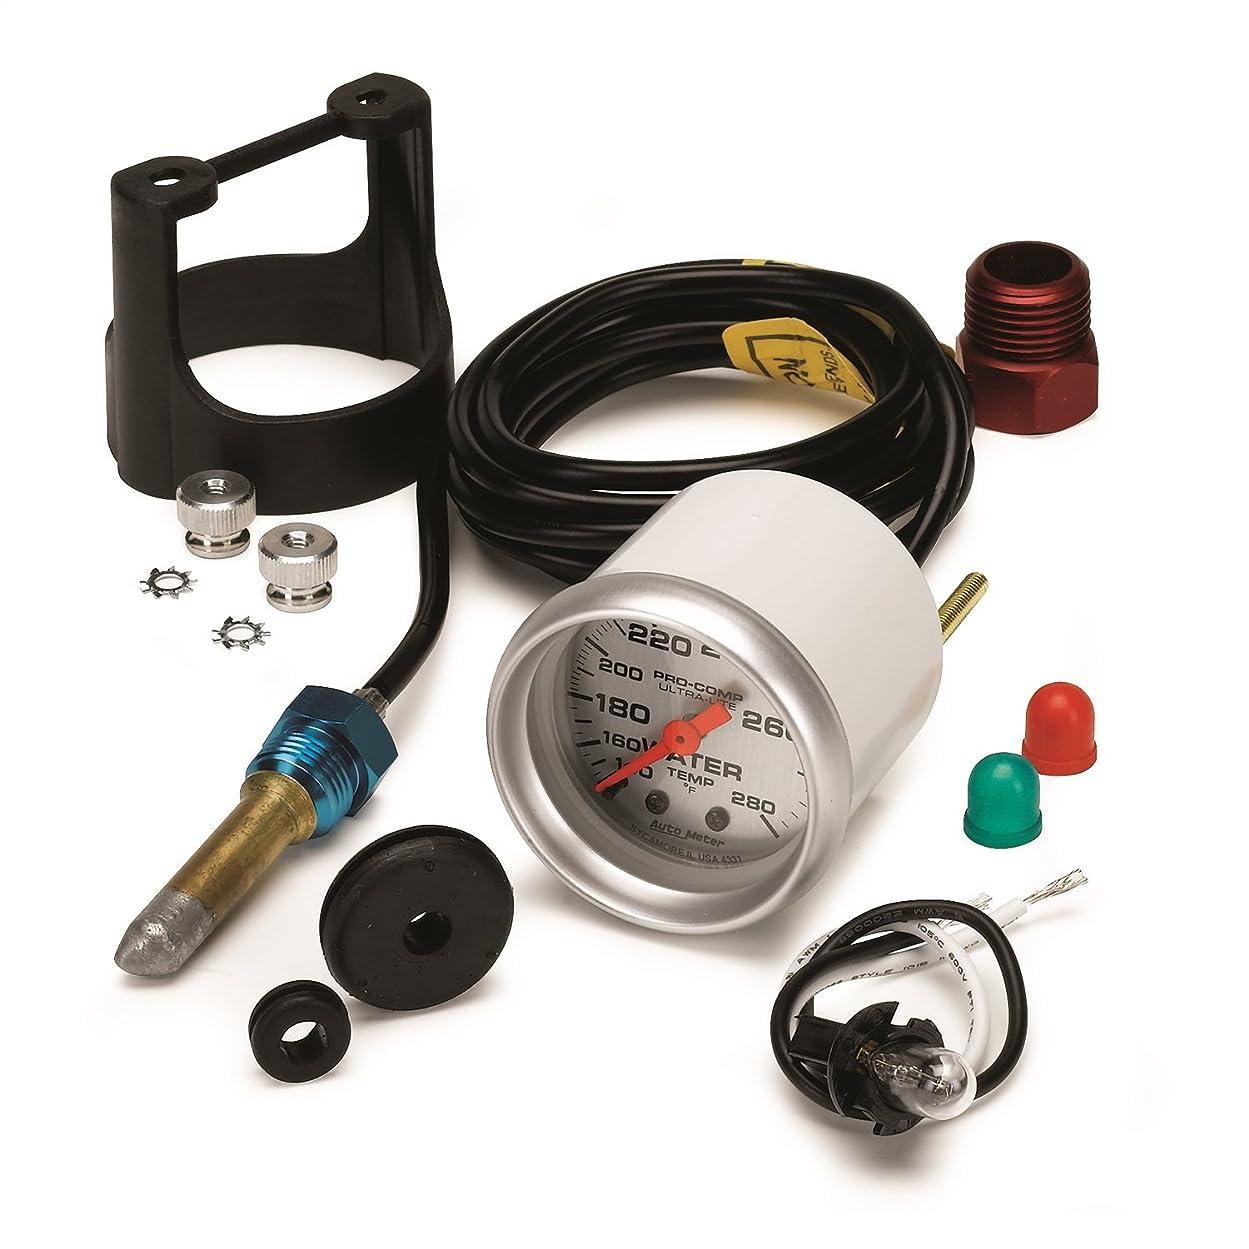 Auto Meter 4331 Ultra-Lite Mechanical Water Temperature Gauge vp42311621735